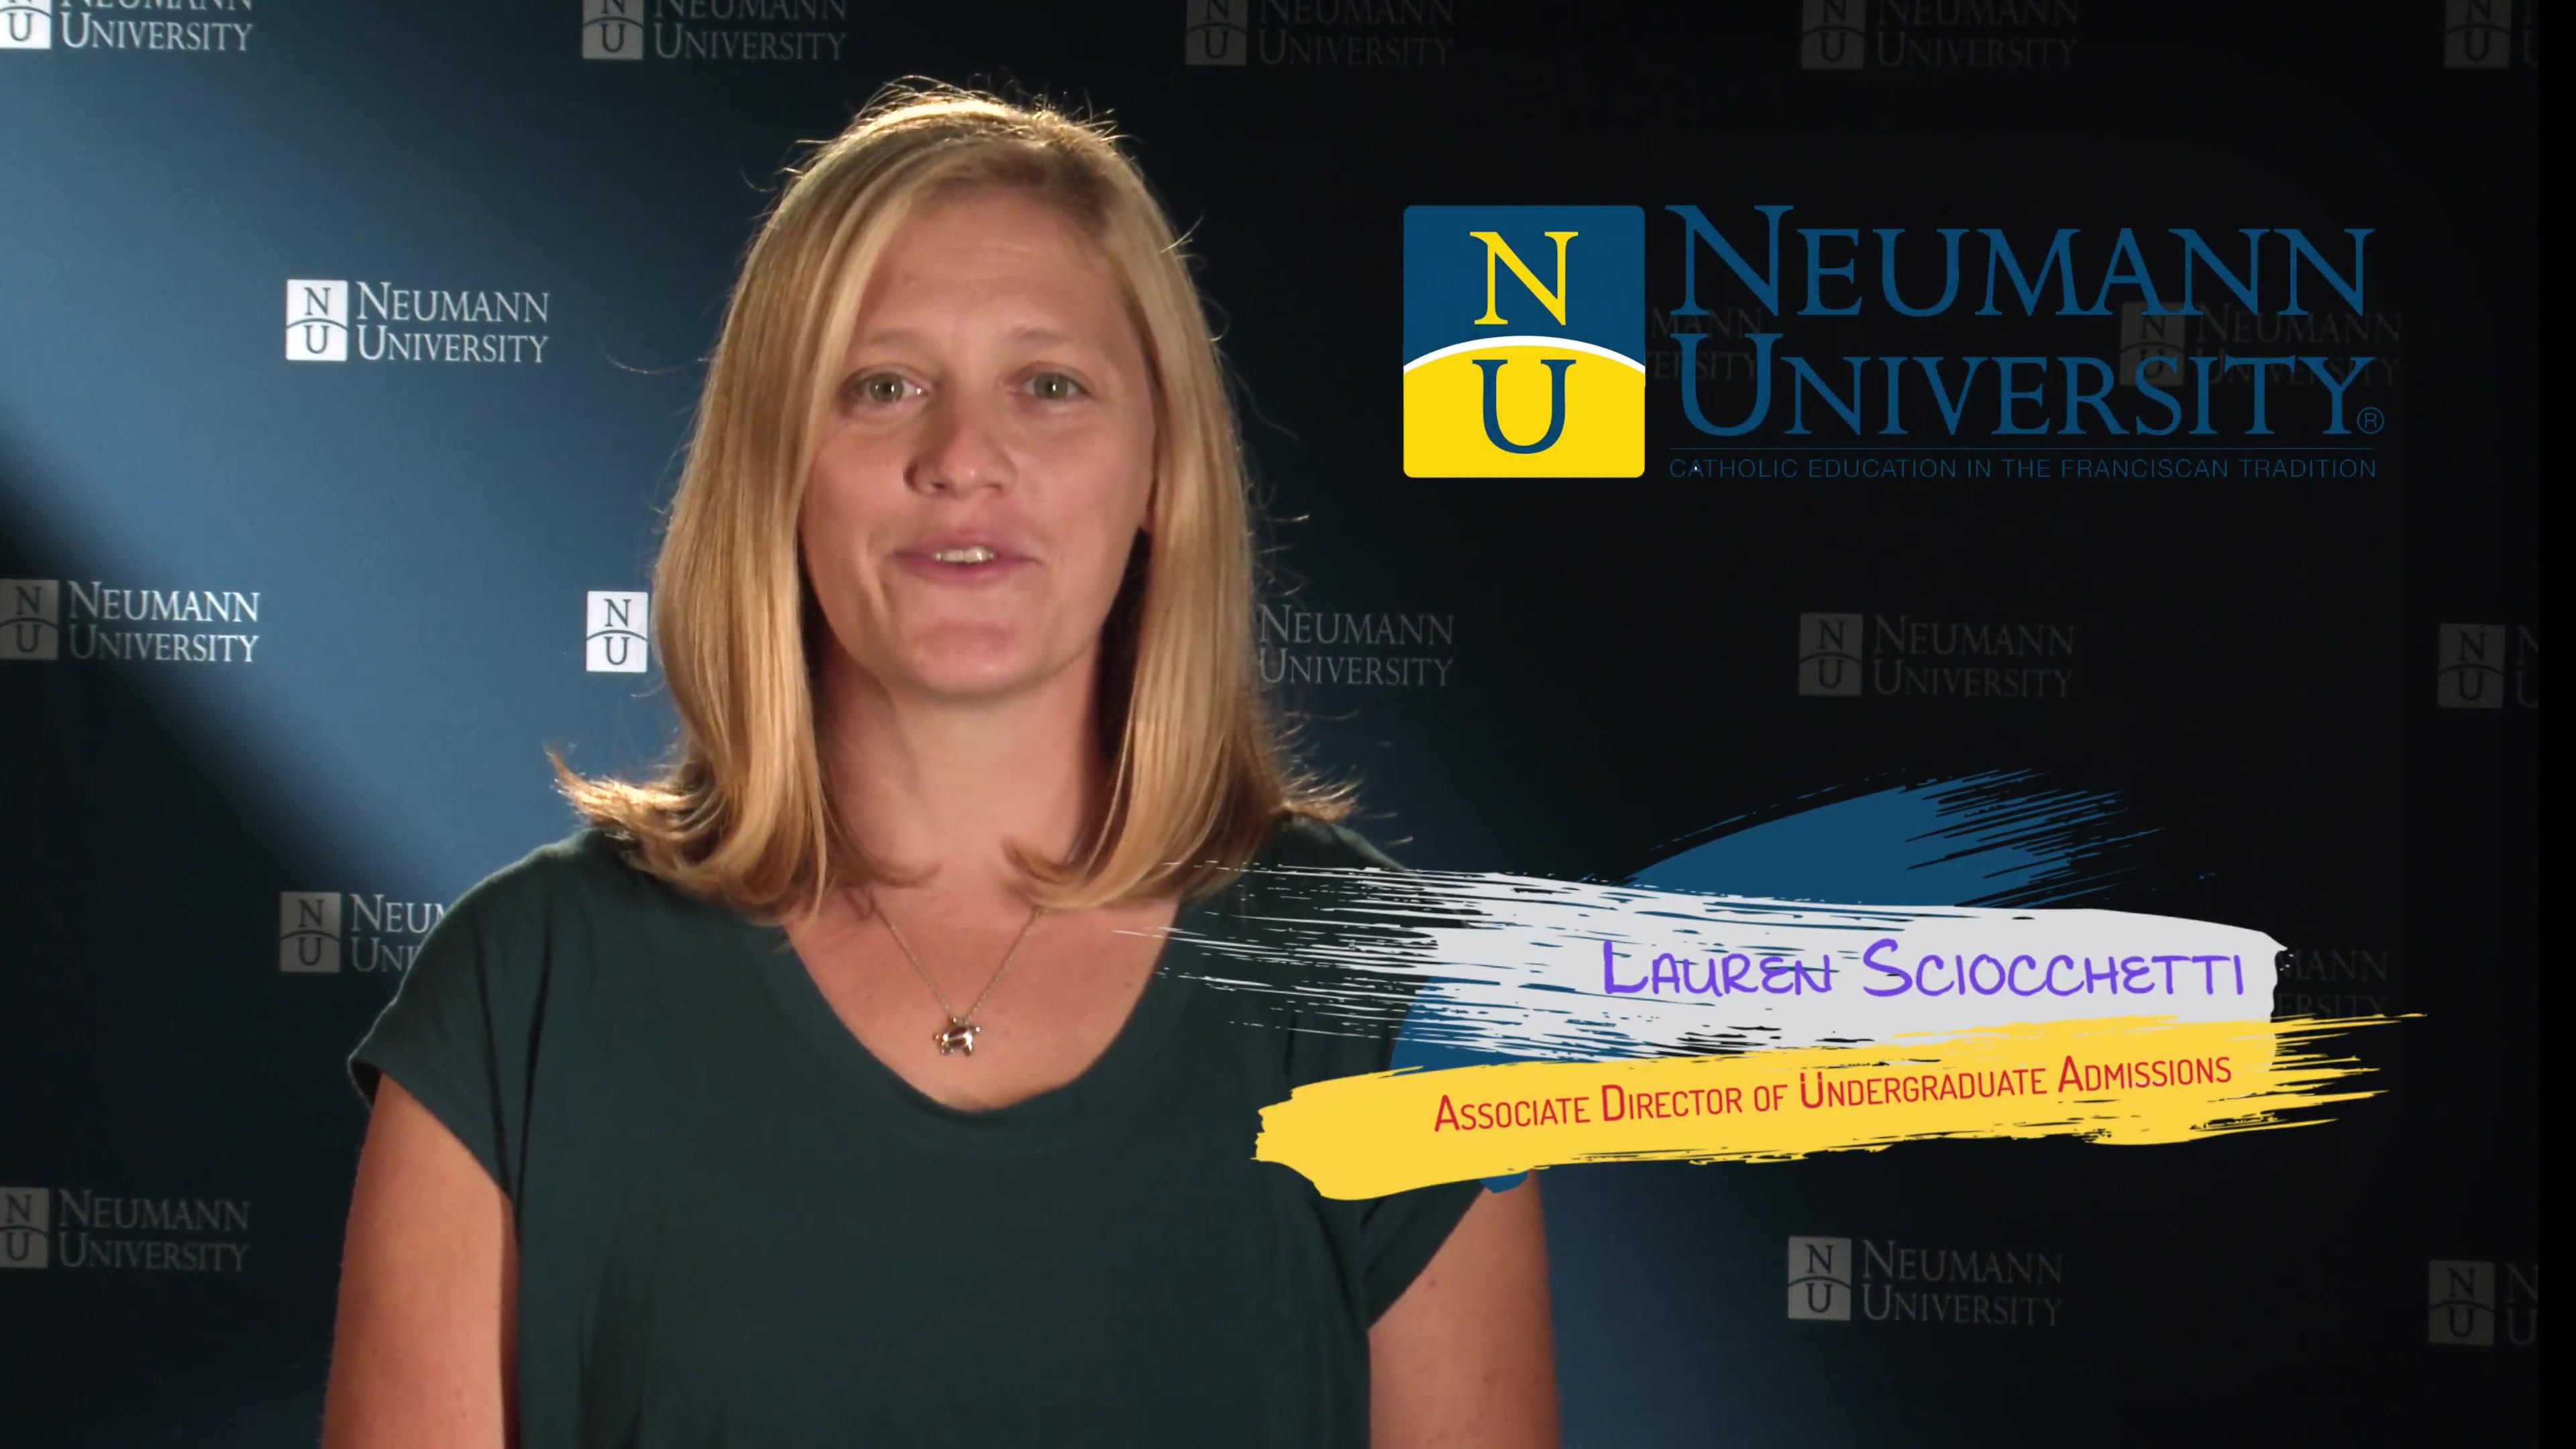 Neumann University - Associate Director of Undergraduate Admissions Lauren Sciocchetti